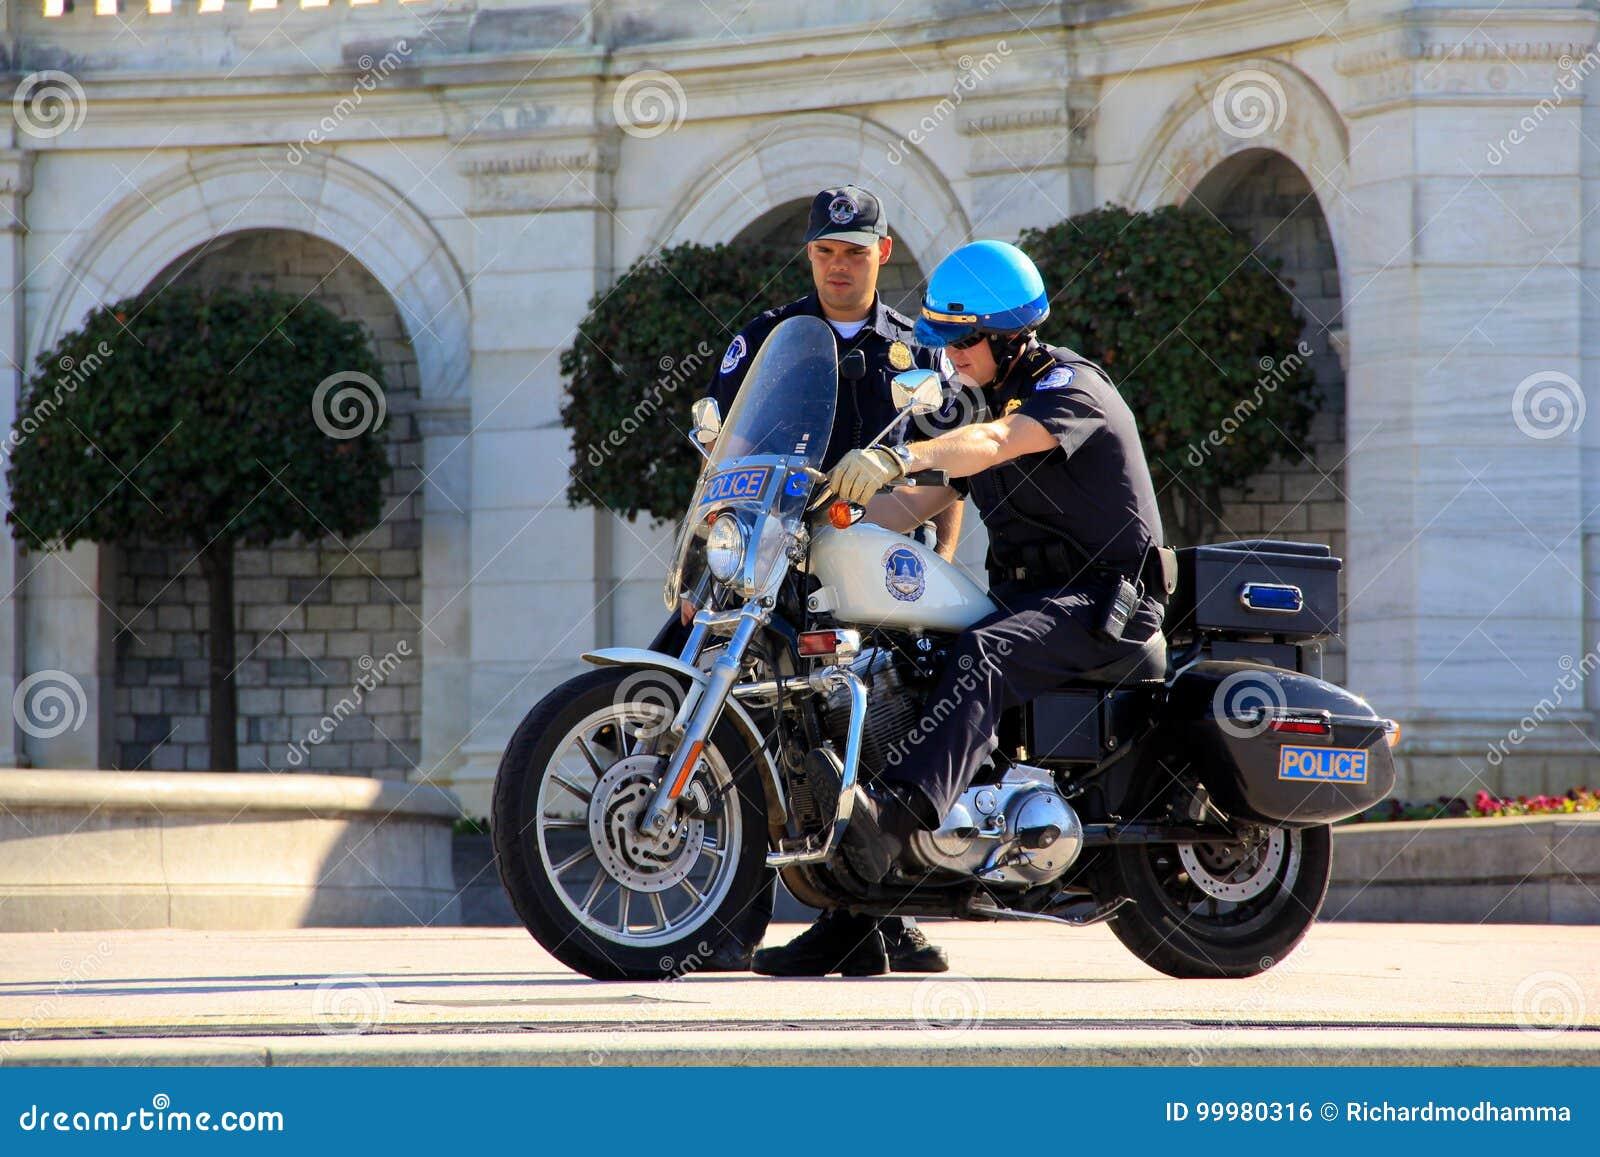 Policiers capitale des USA